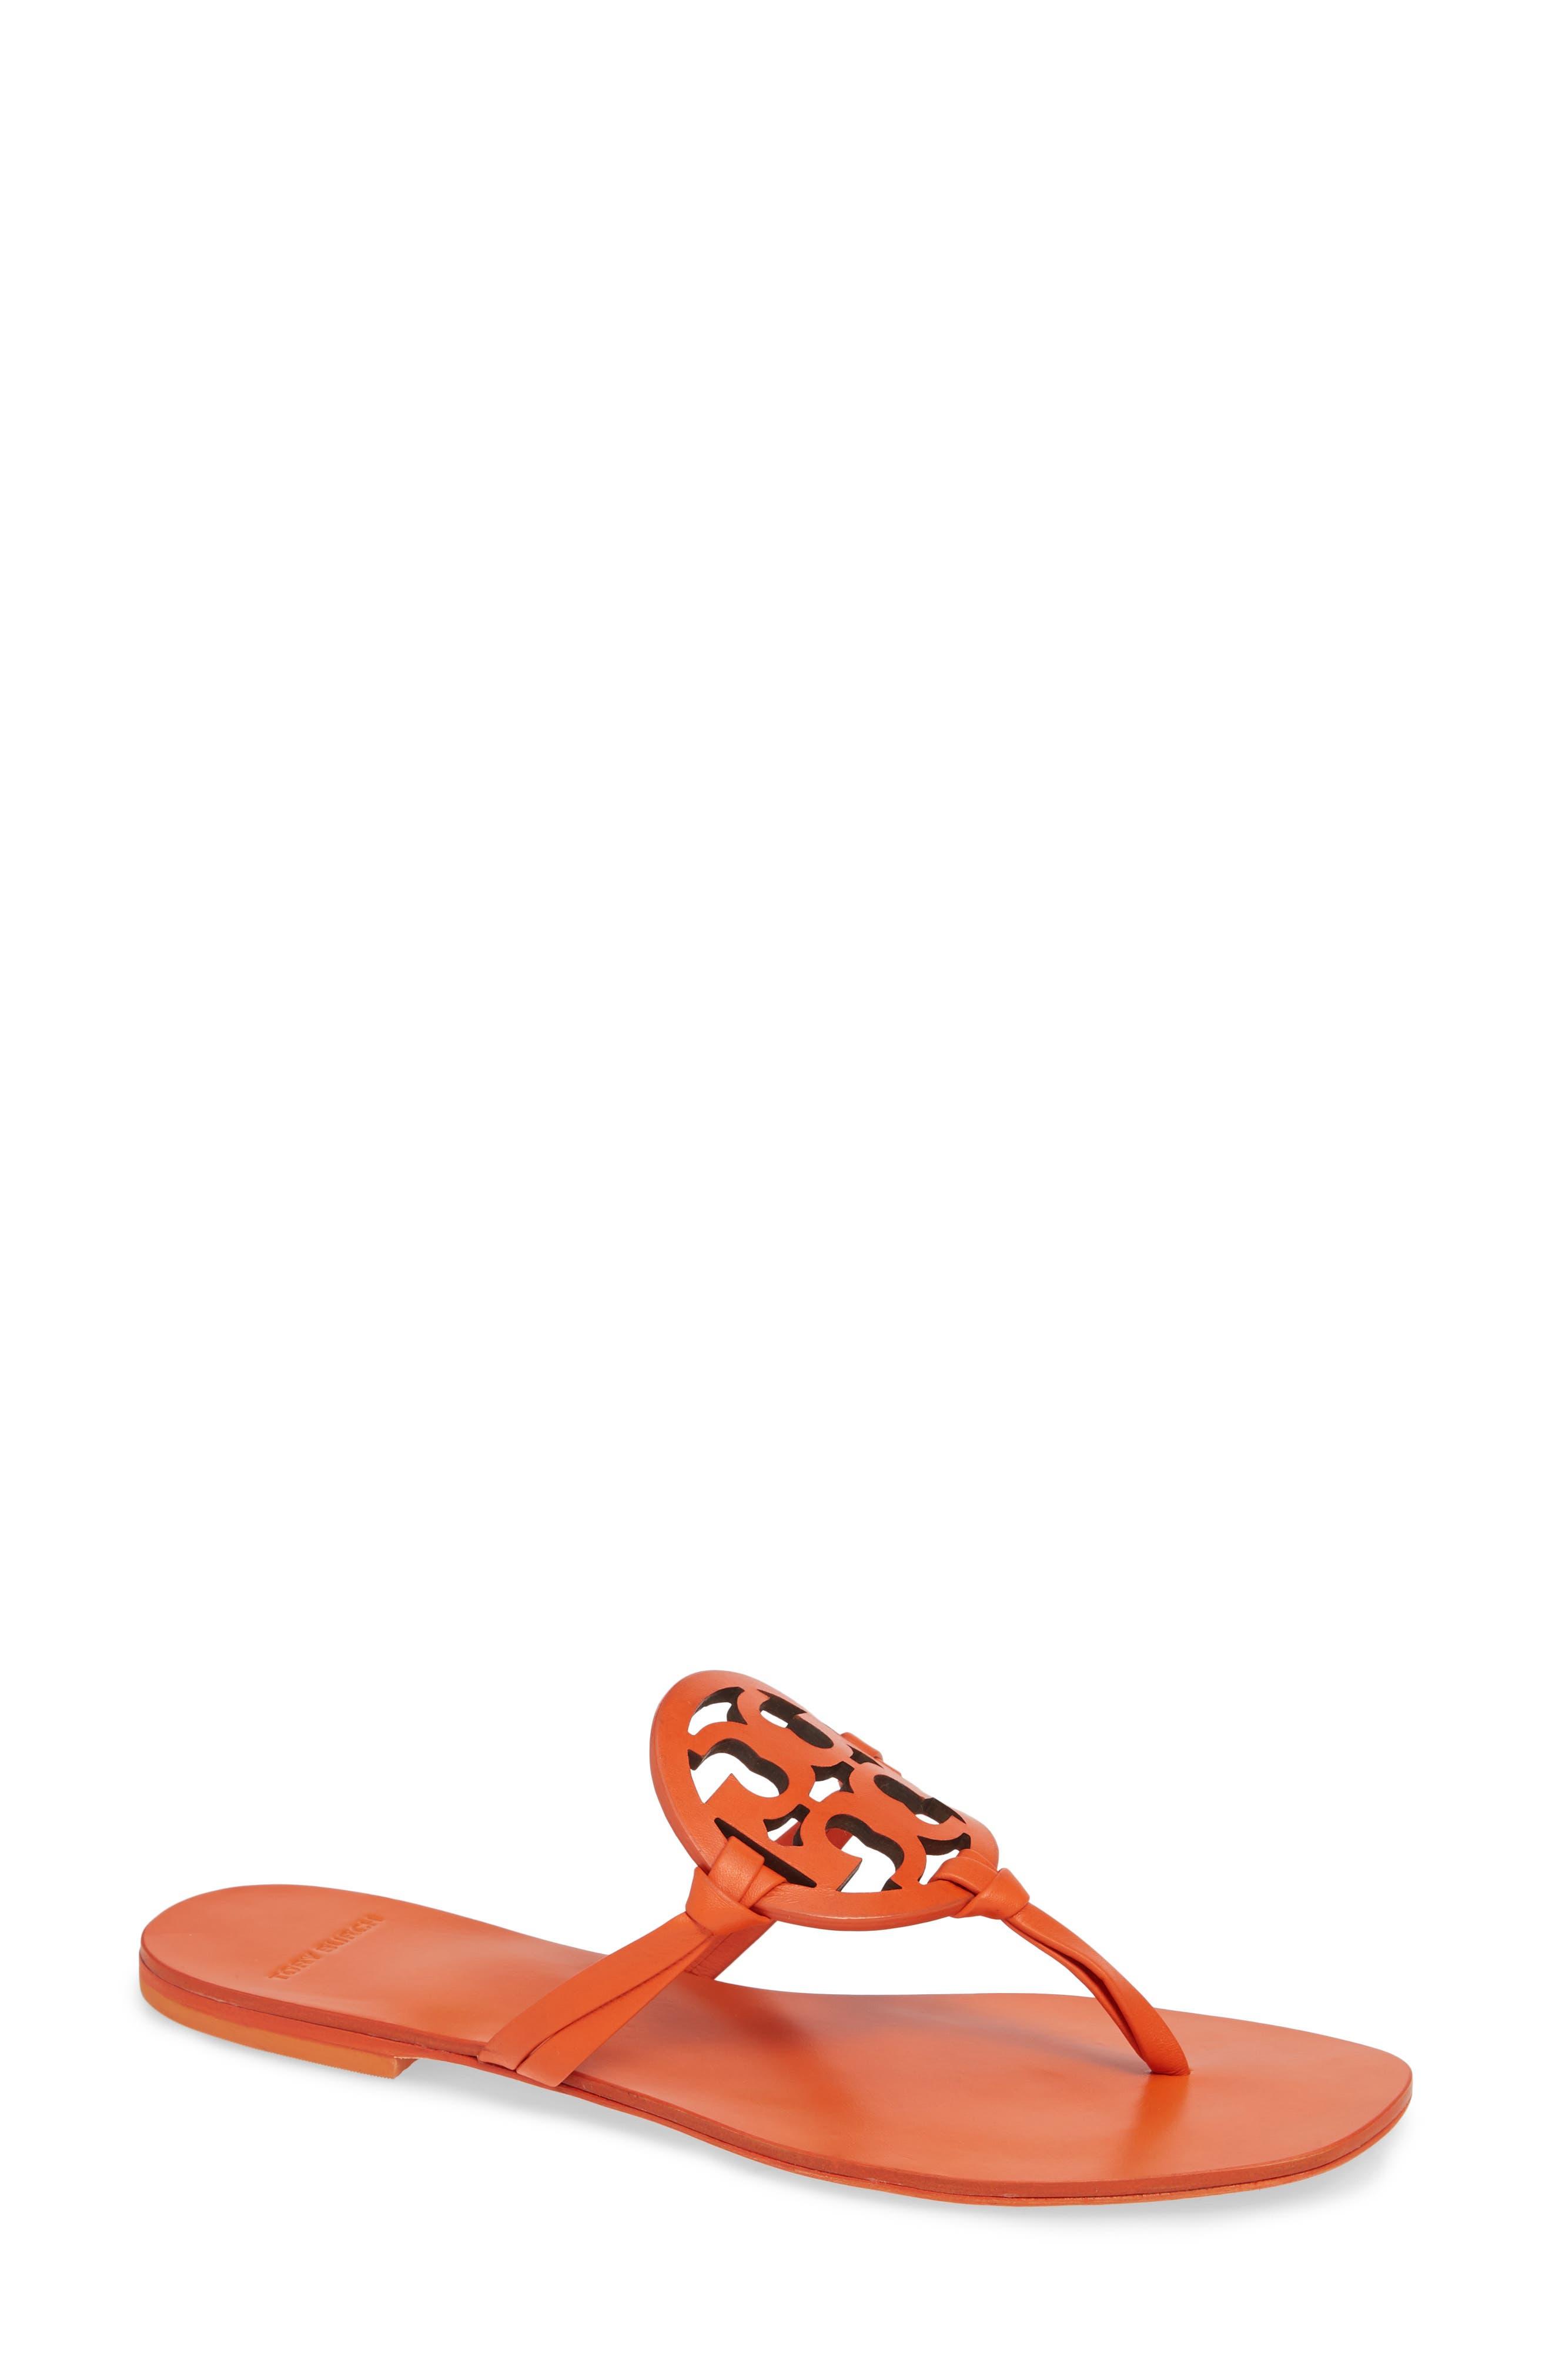 Tory Burch Miller Square Toe Thong Sandal, Orange